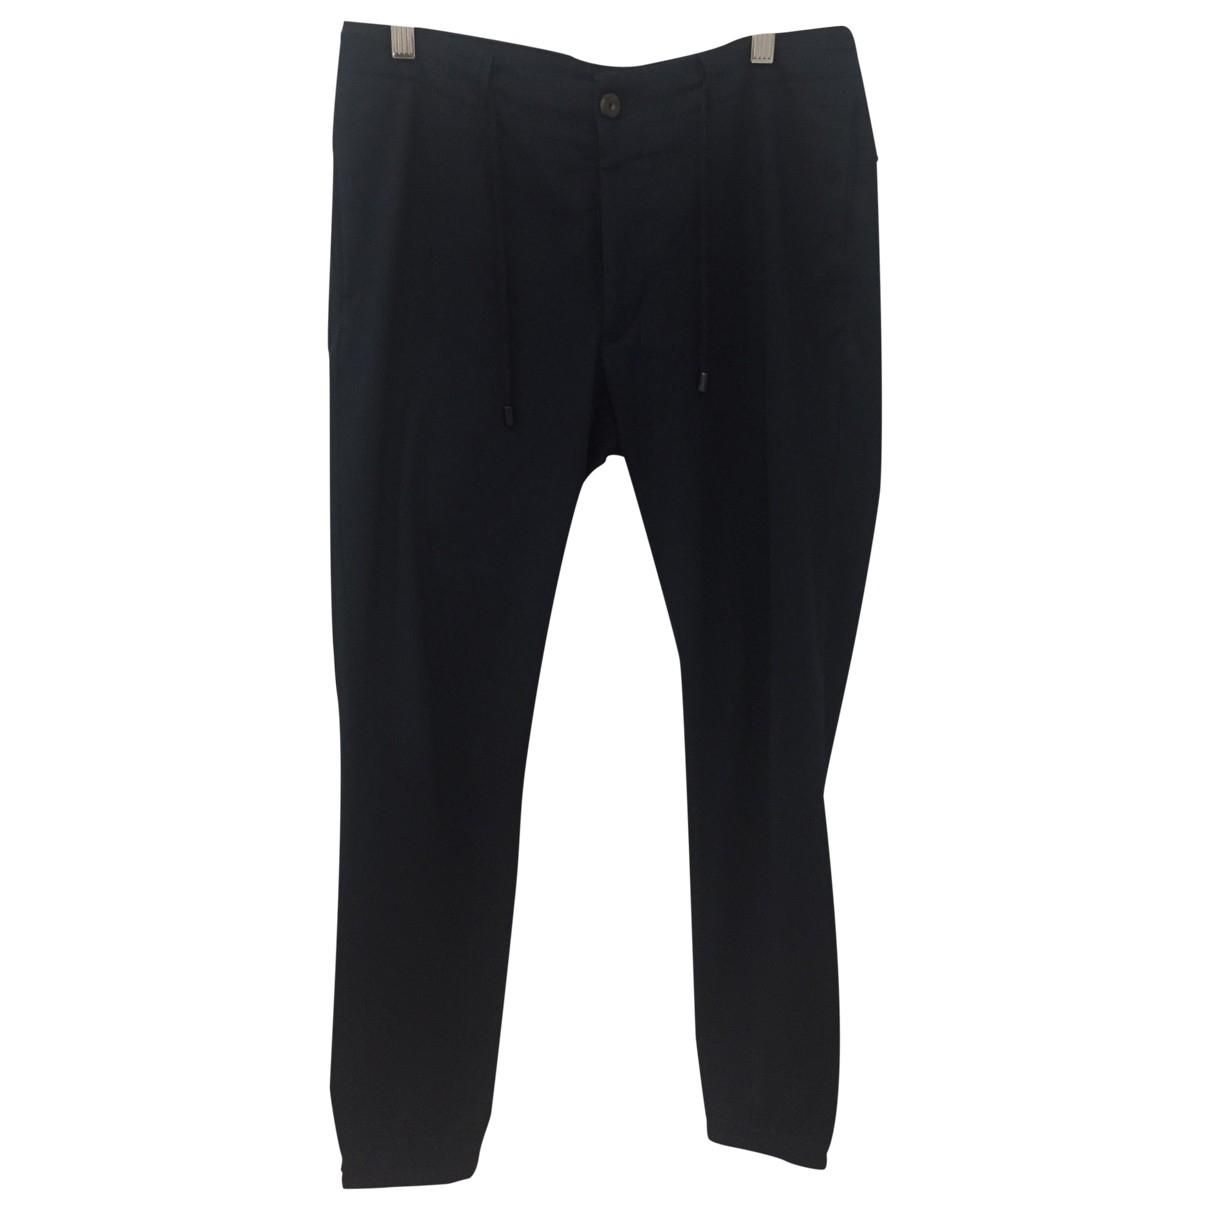 Zara \N Blue Cotton Trousers for Men S International